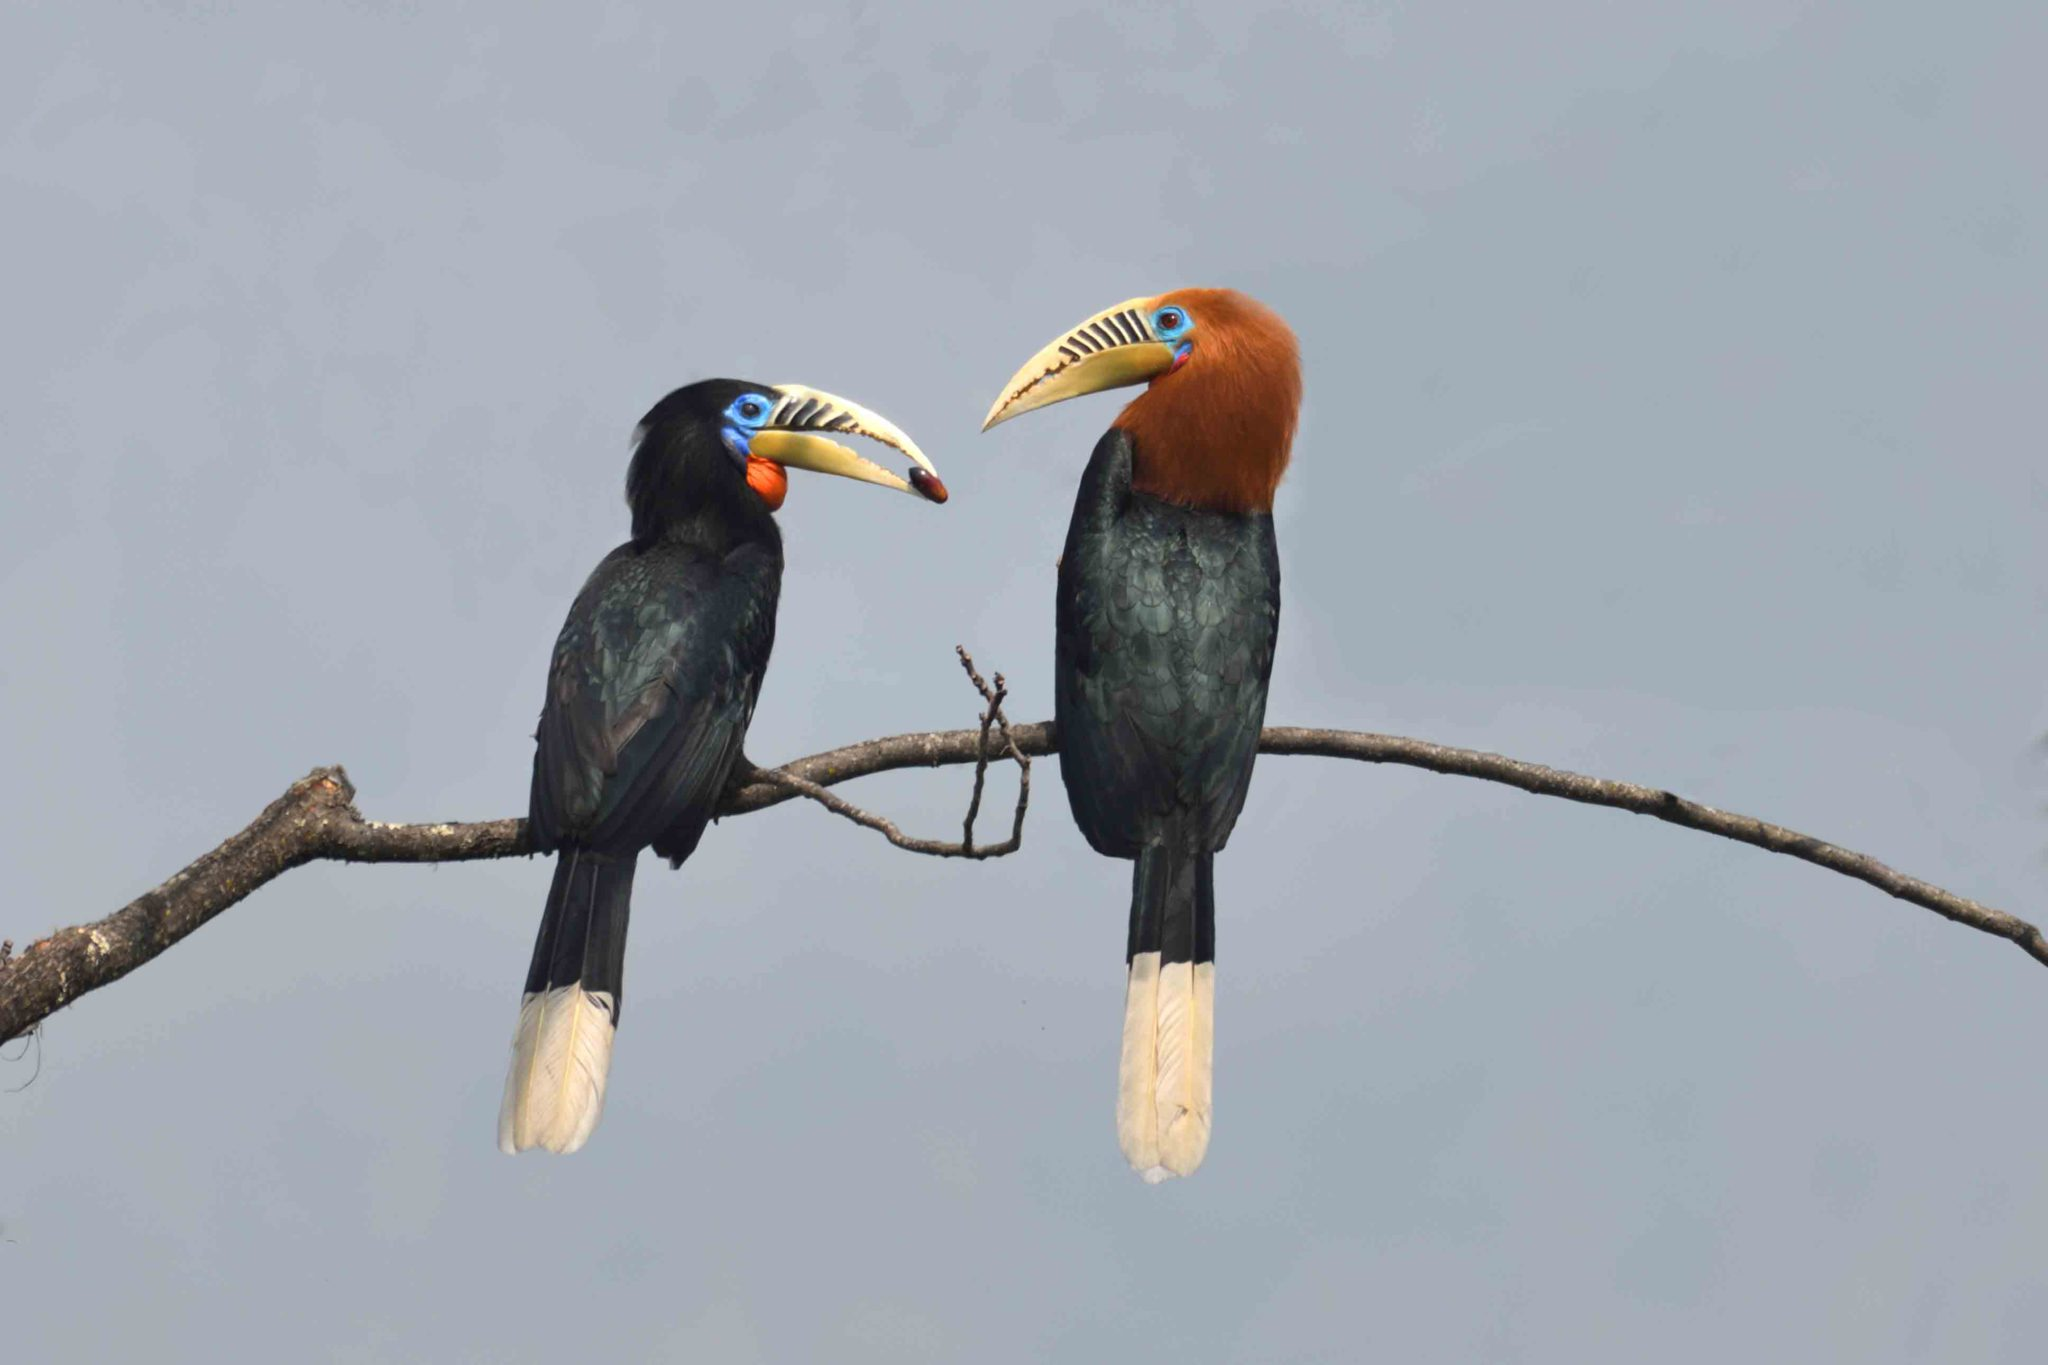 16 day culture tour and birding safari holiday in Bhutan